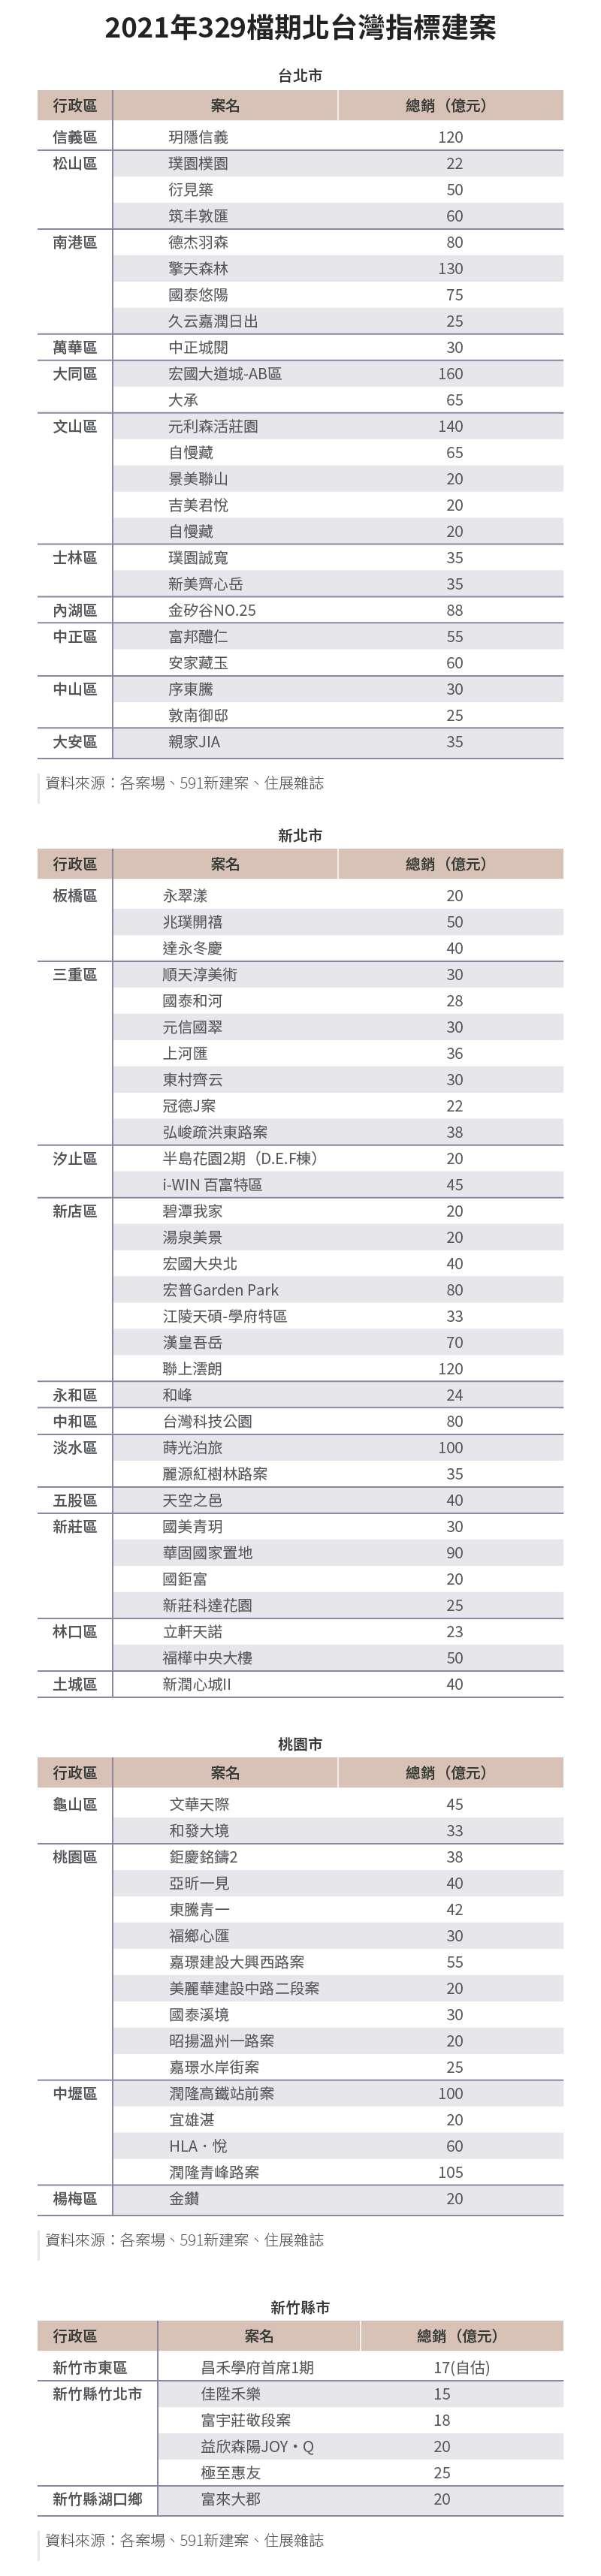 20210317-SMG0034-E01_a_2021年329檔期北台灣指標建案